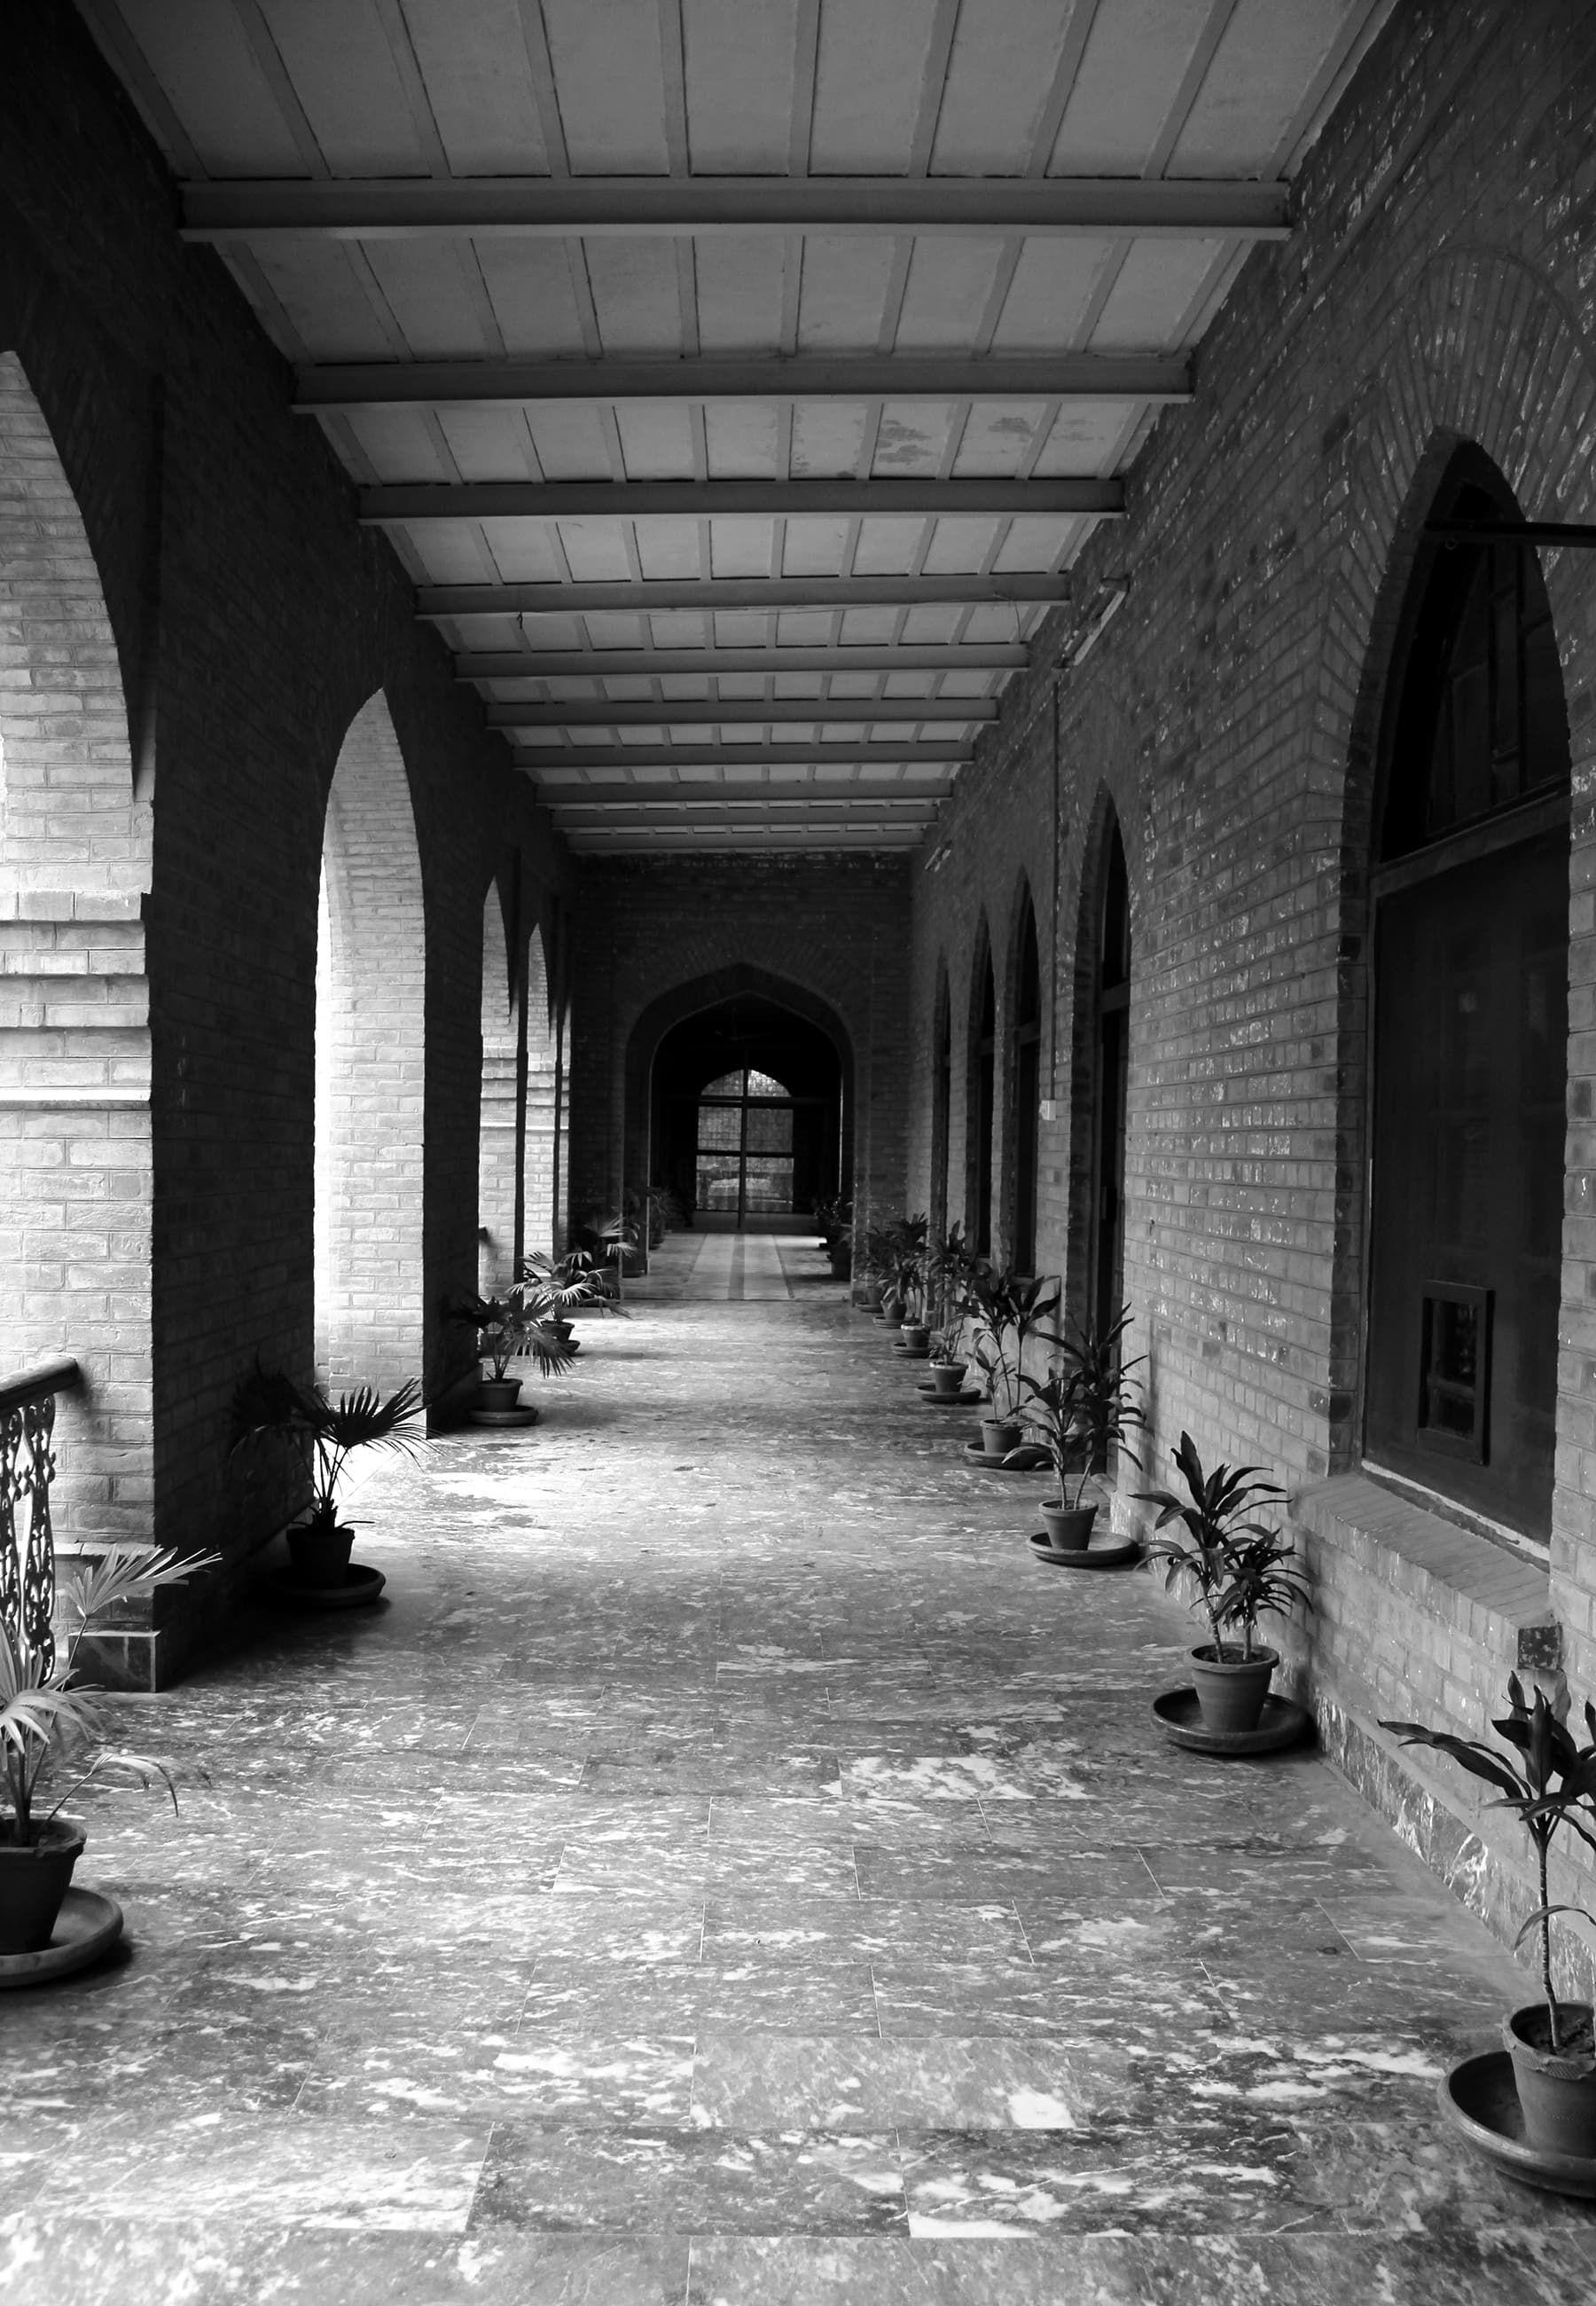 Corridor administrative wing islamia college peshawar